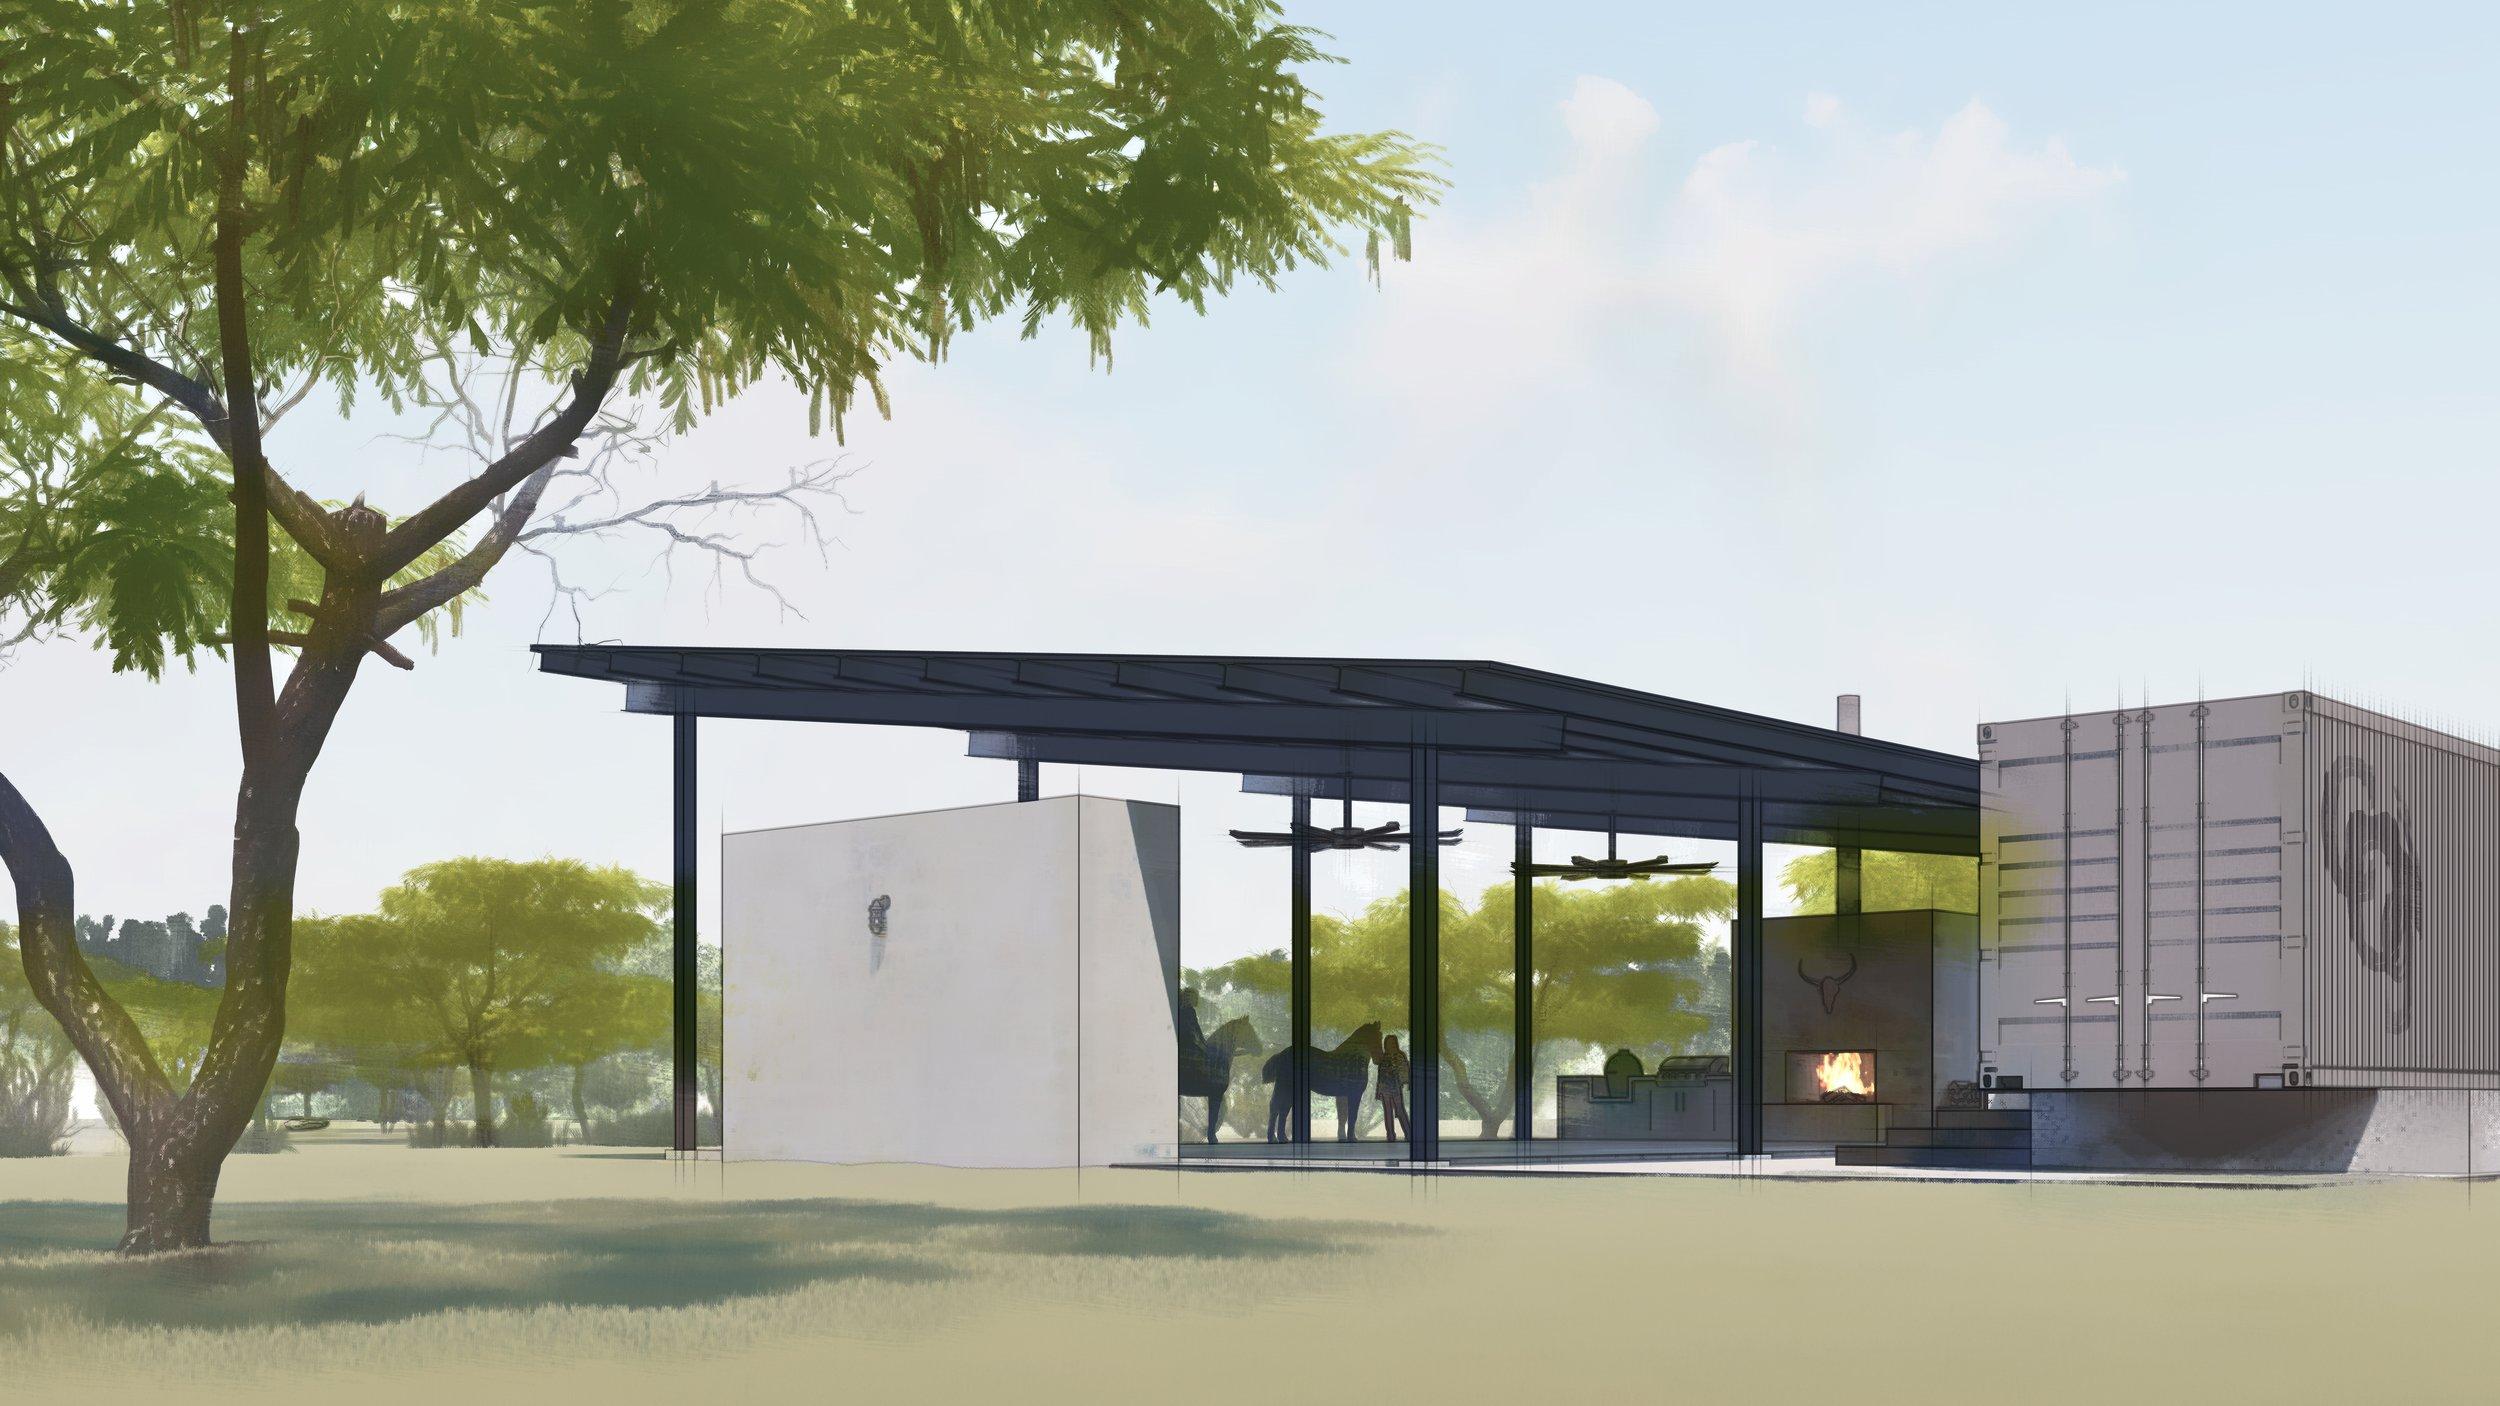 Jeff Garnett Architect_Pavilion 02c watercolor.jpg